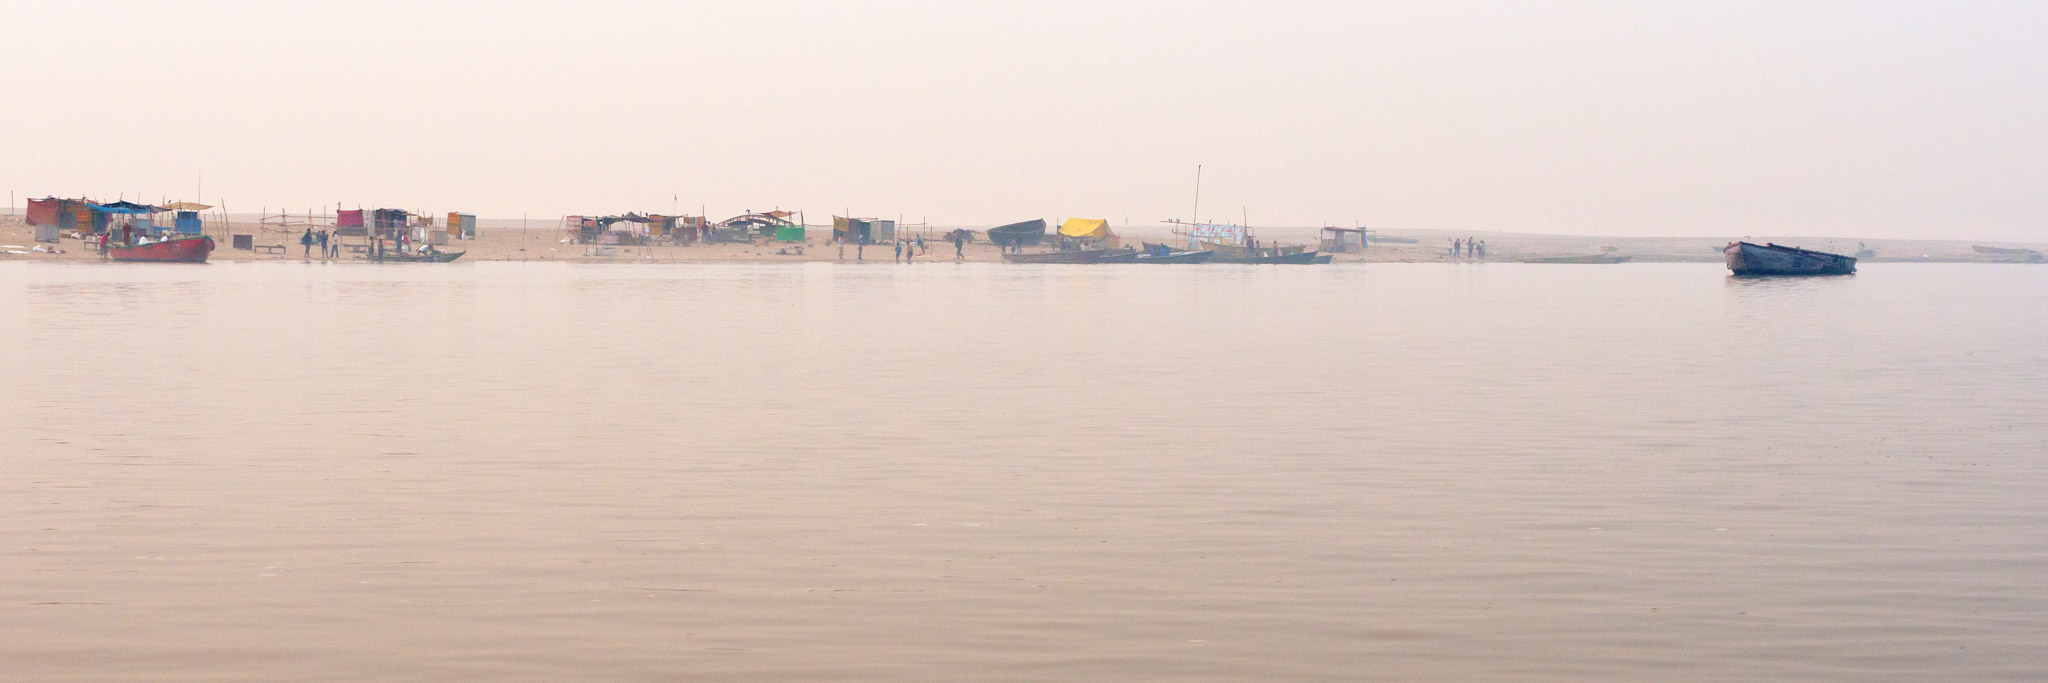 East Side of Ganges, Varanasi, India